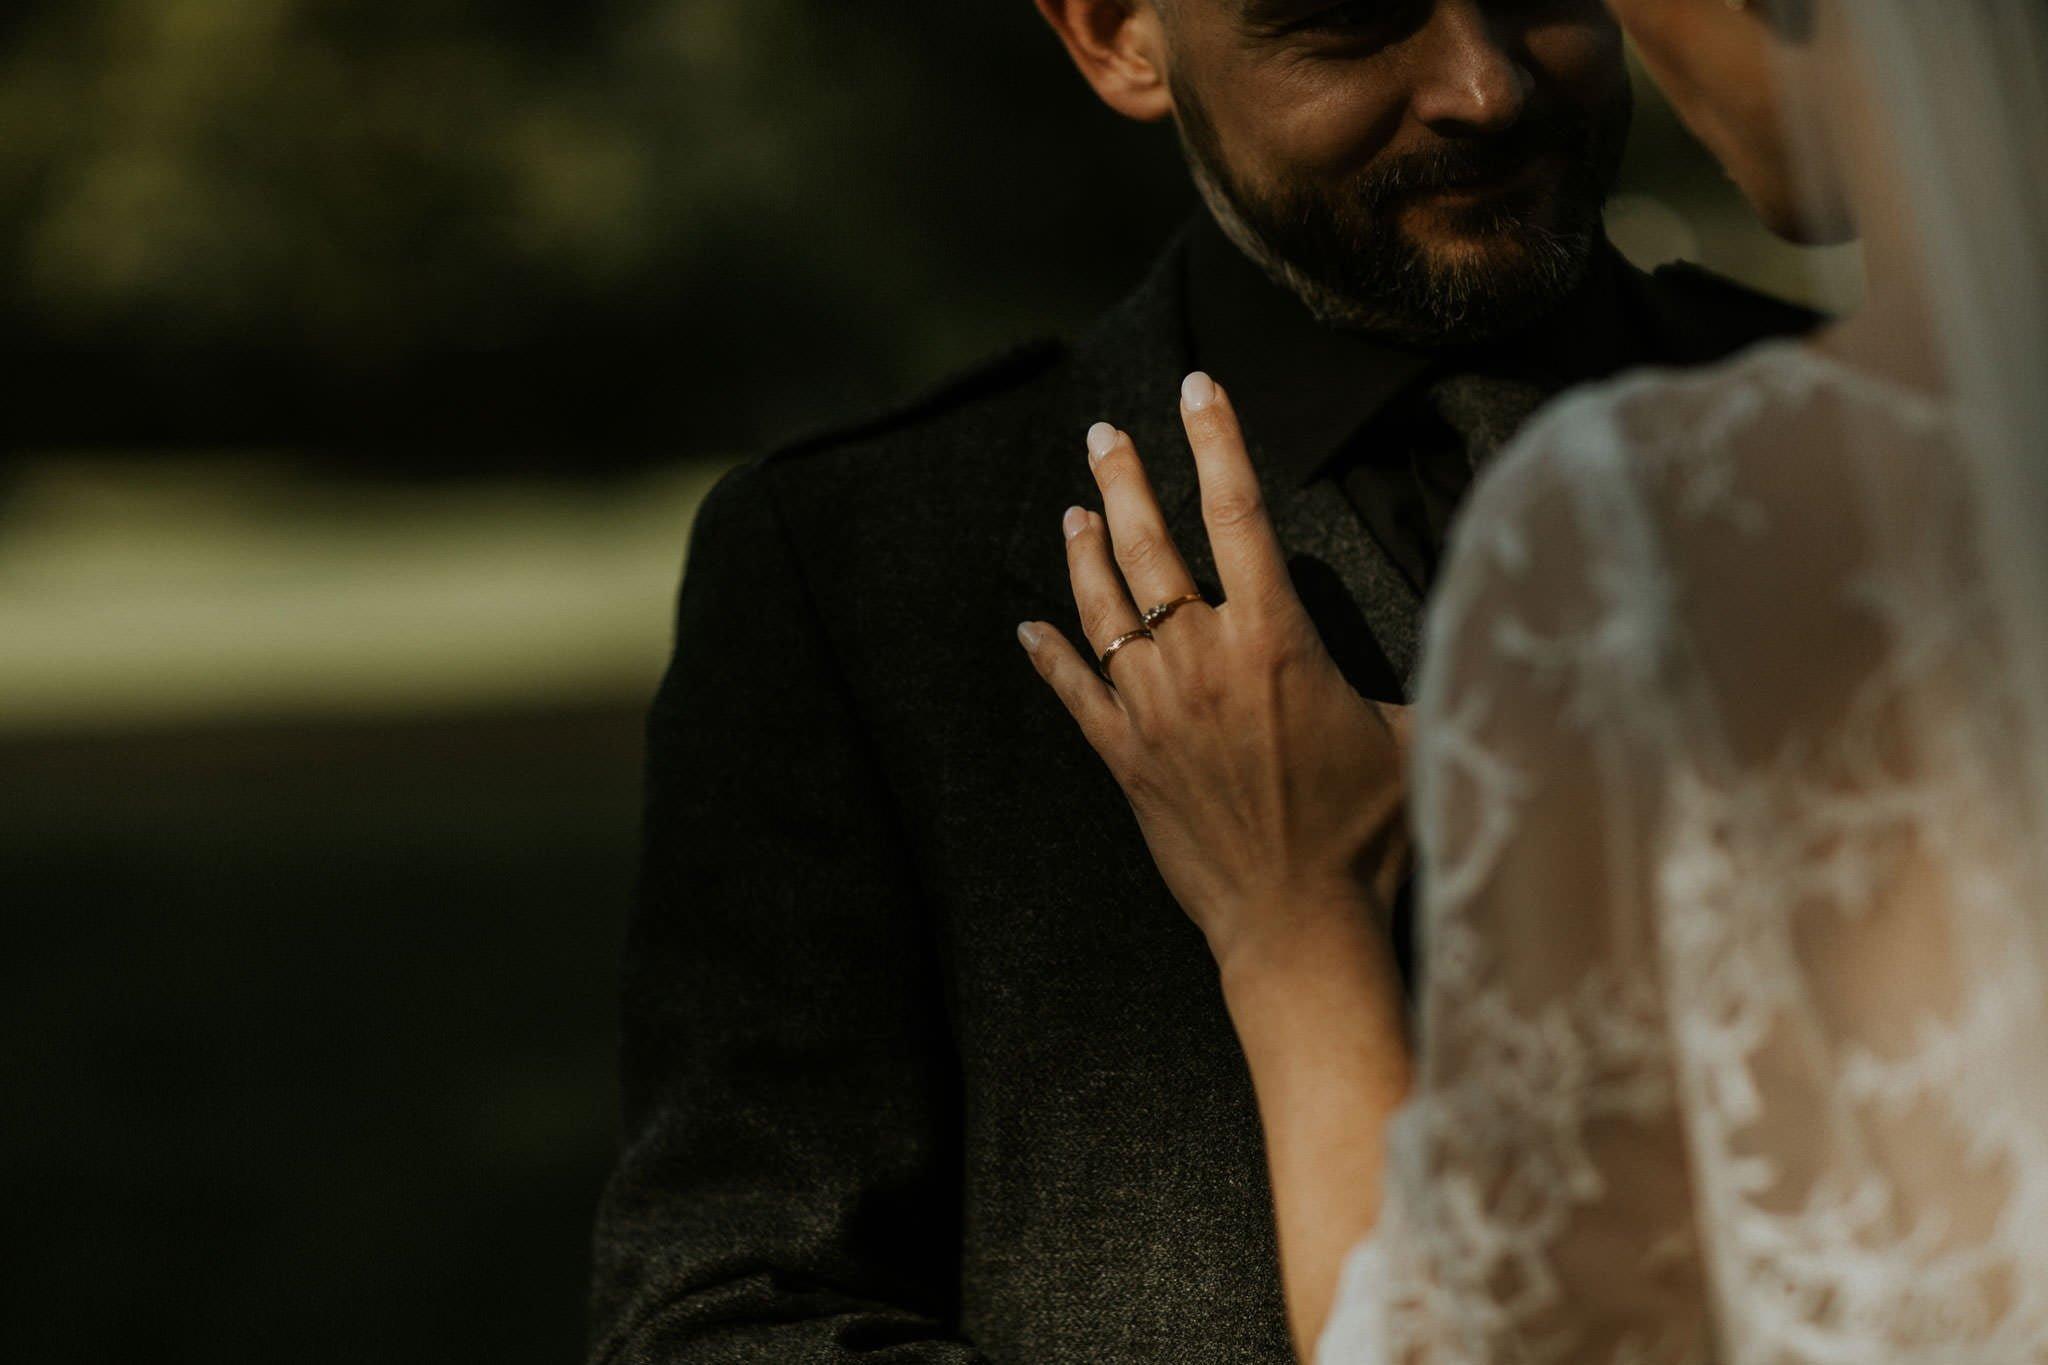 fine-art-wedding-photography-scotland 070